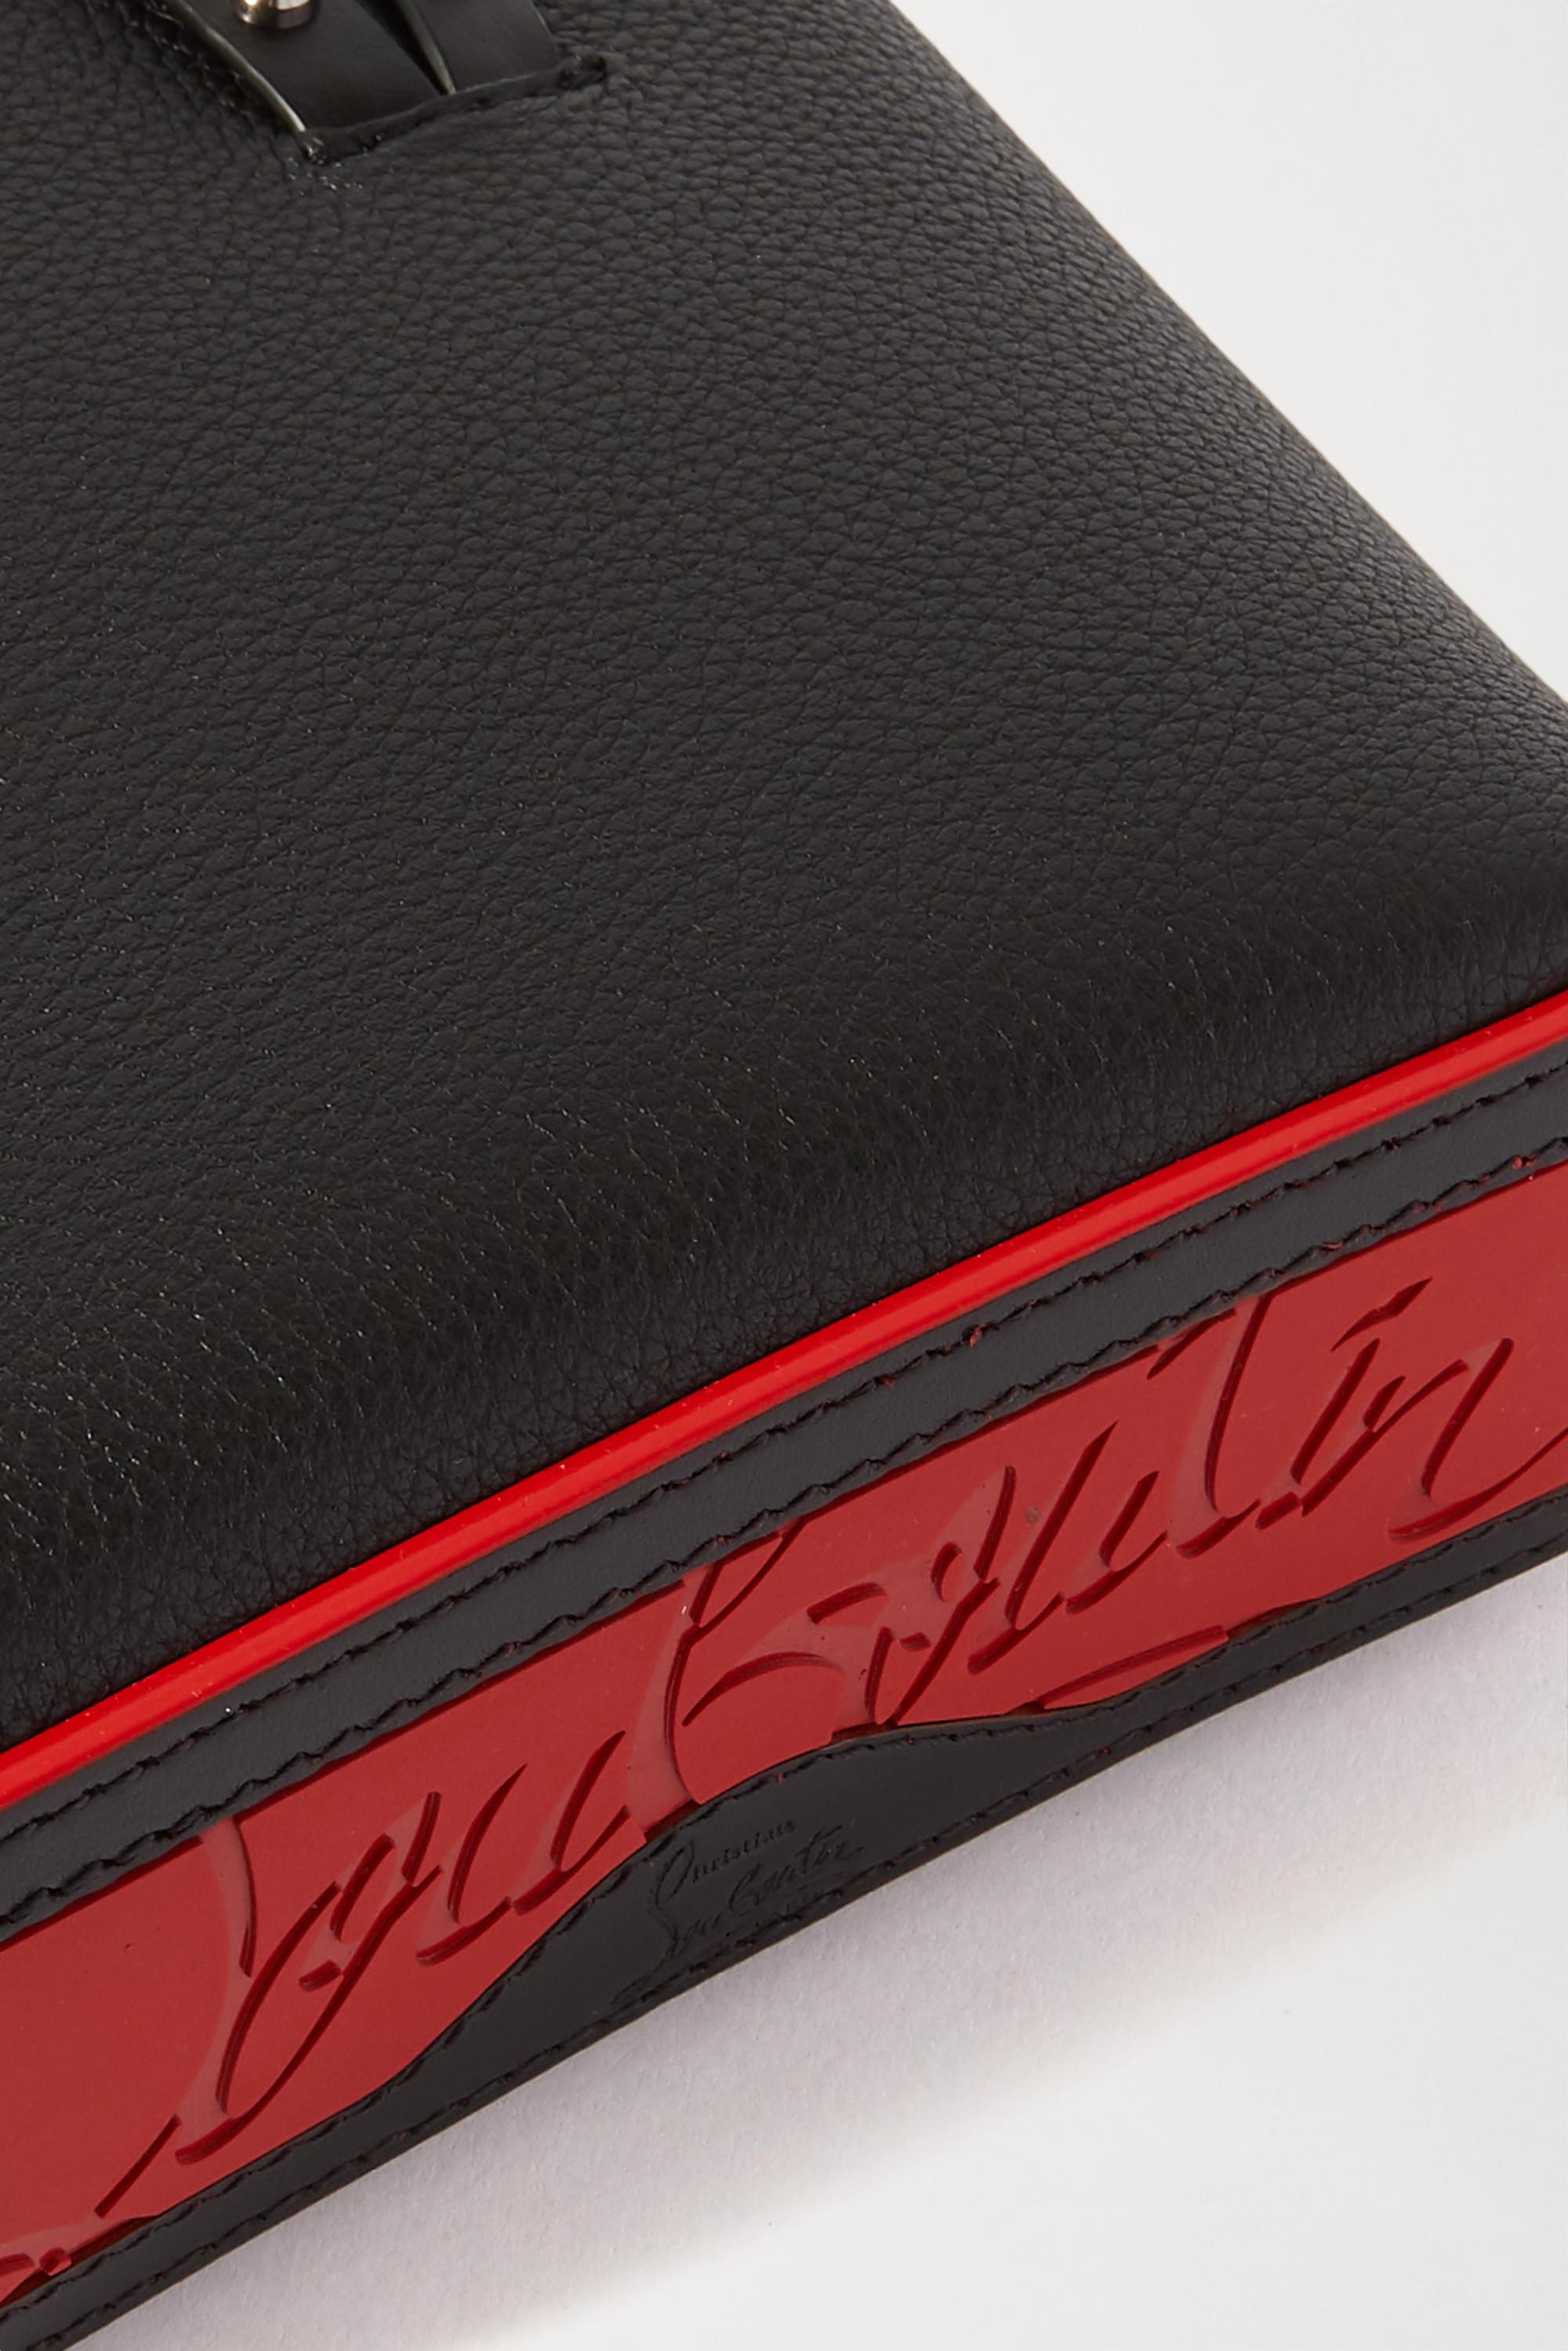 Christian Louboutin Cabata mini spiked textured-leather tote